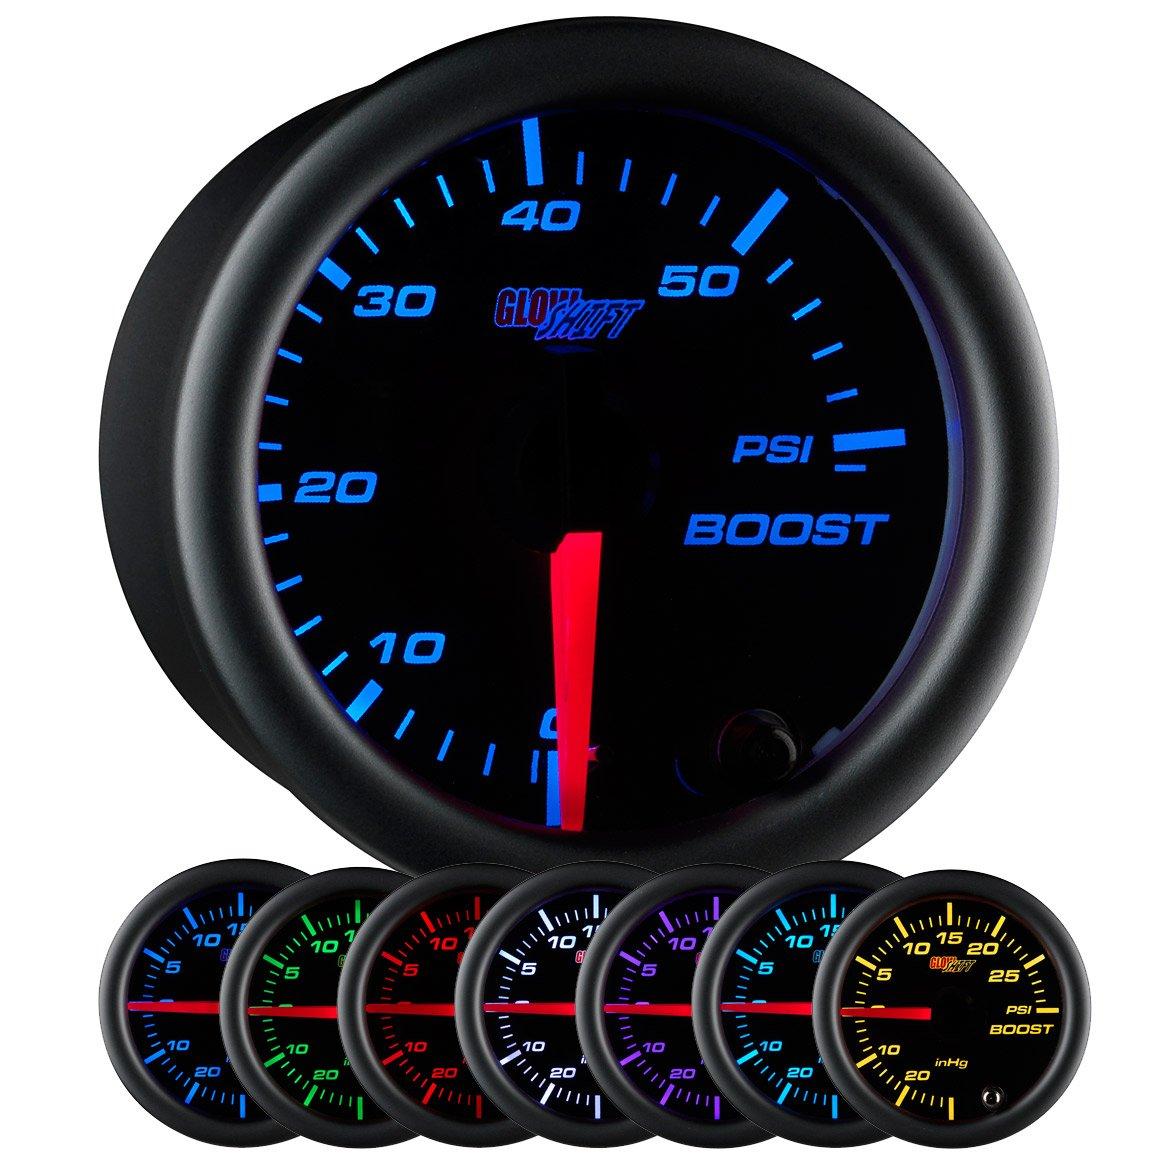 2-1//16 52mm Black Dial For Diesel Trucks Clear Lens GlowShift Black 7 Color 60 PSI Turbo Boost Gauge Kit Includes Mechanical Hose /& Fittings